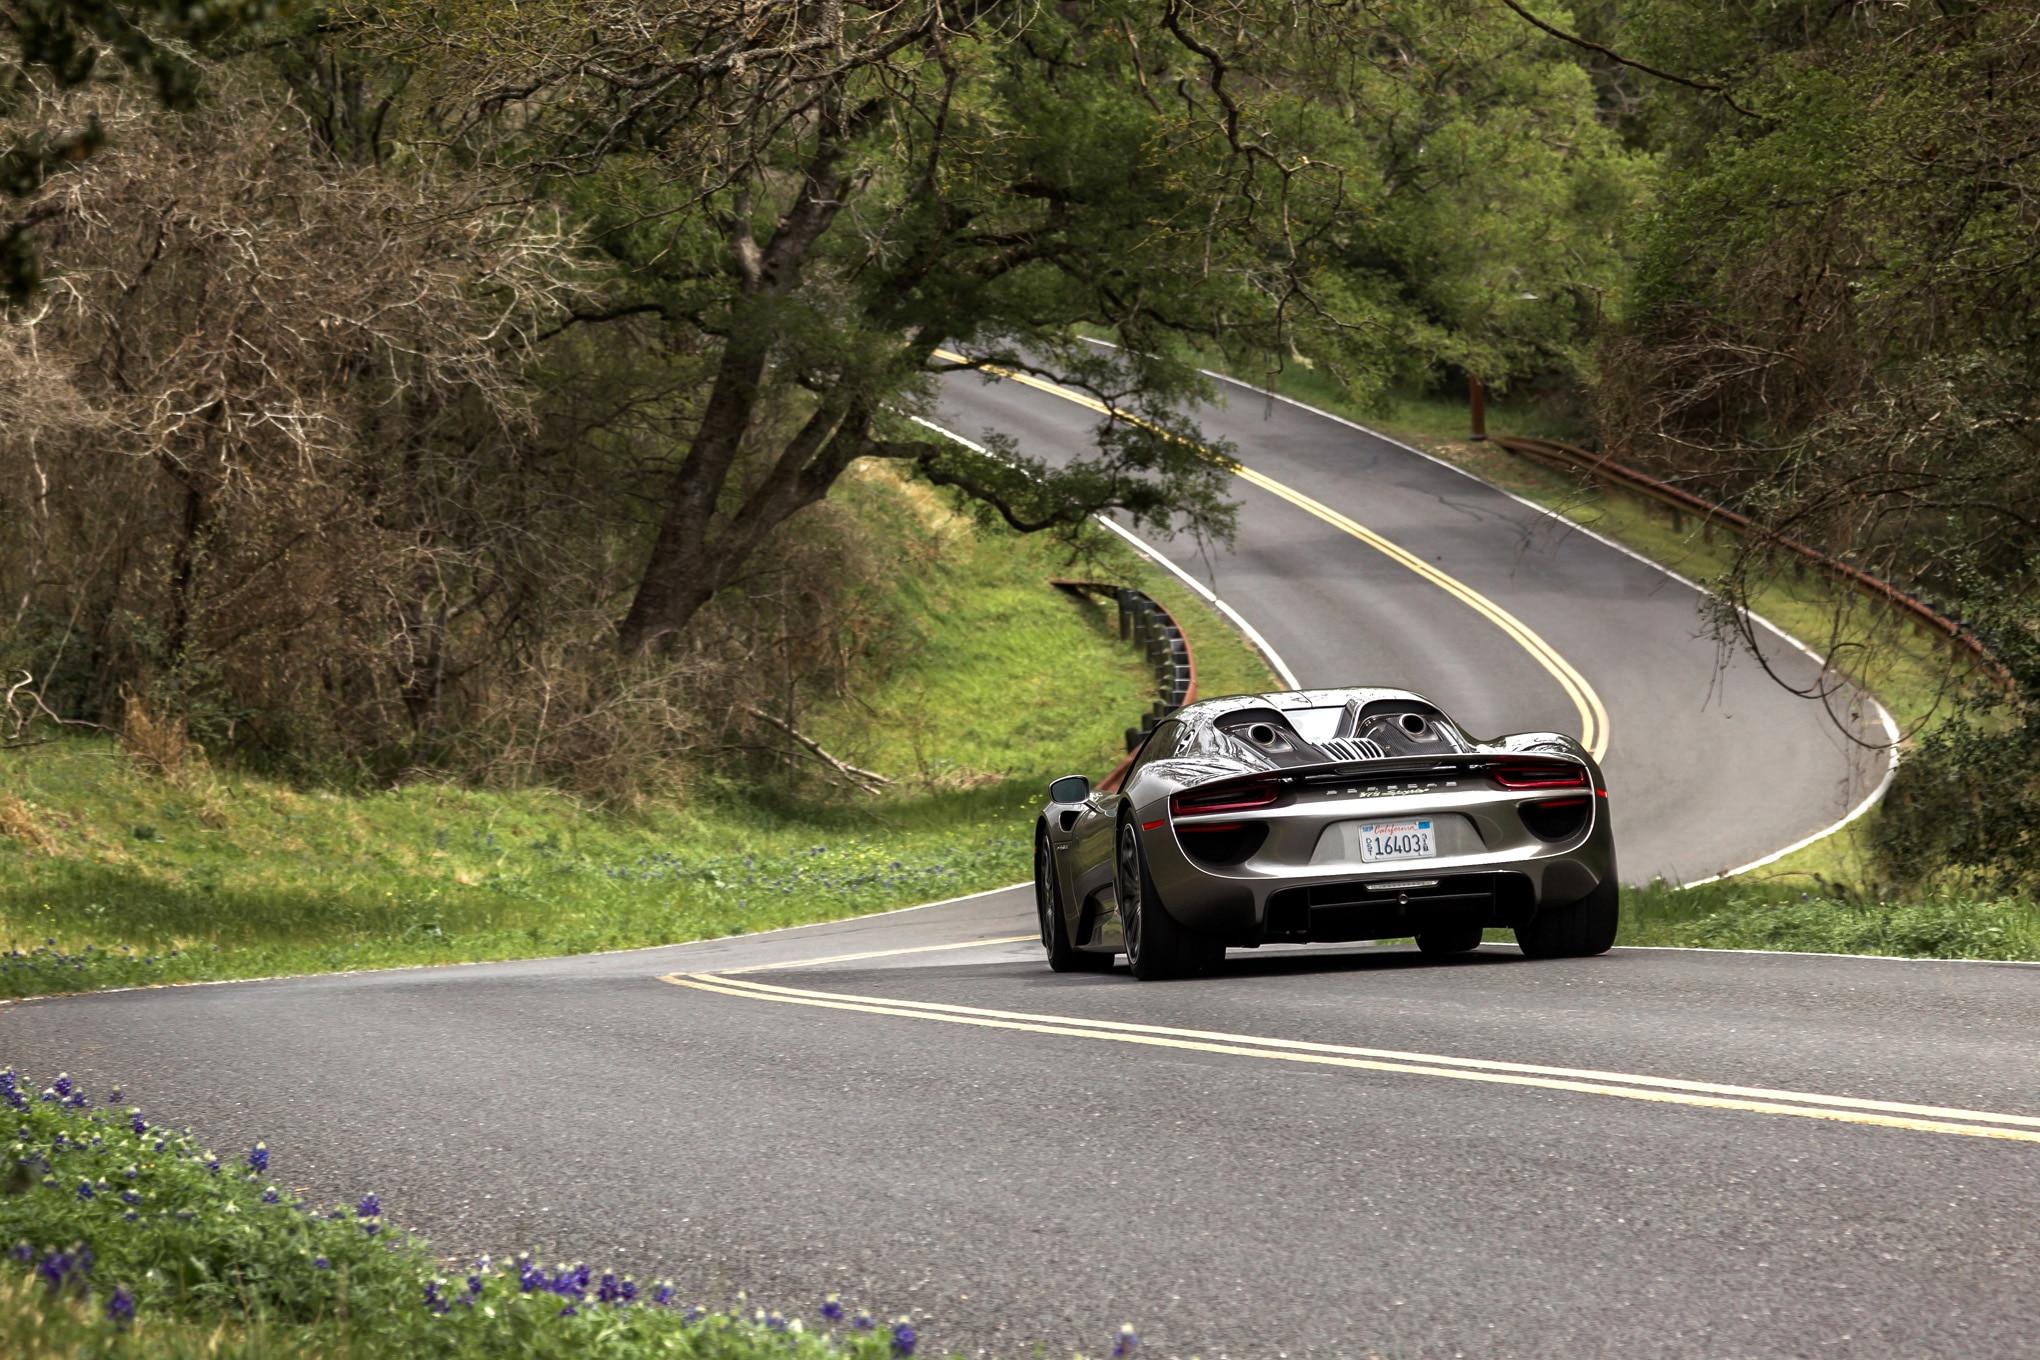 2015-Porsche-918-Spyder-rear-end-in-motion Remarkable Porsche 918 Spyder On the Road Cars Trend